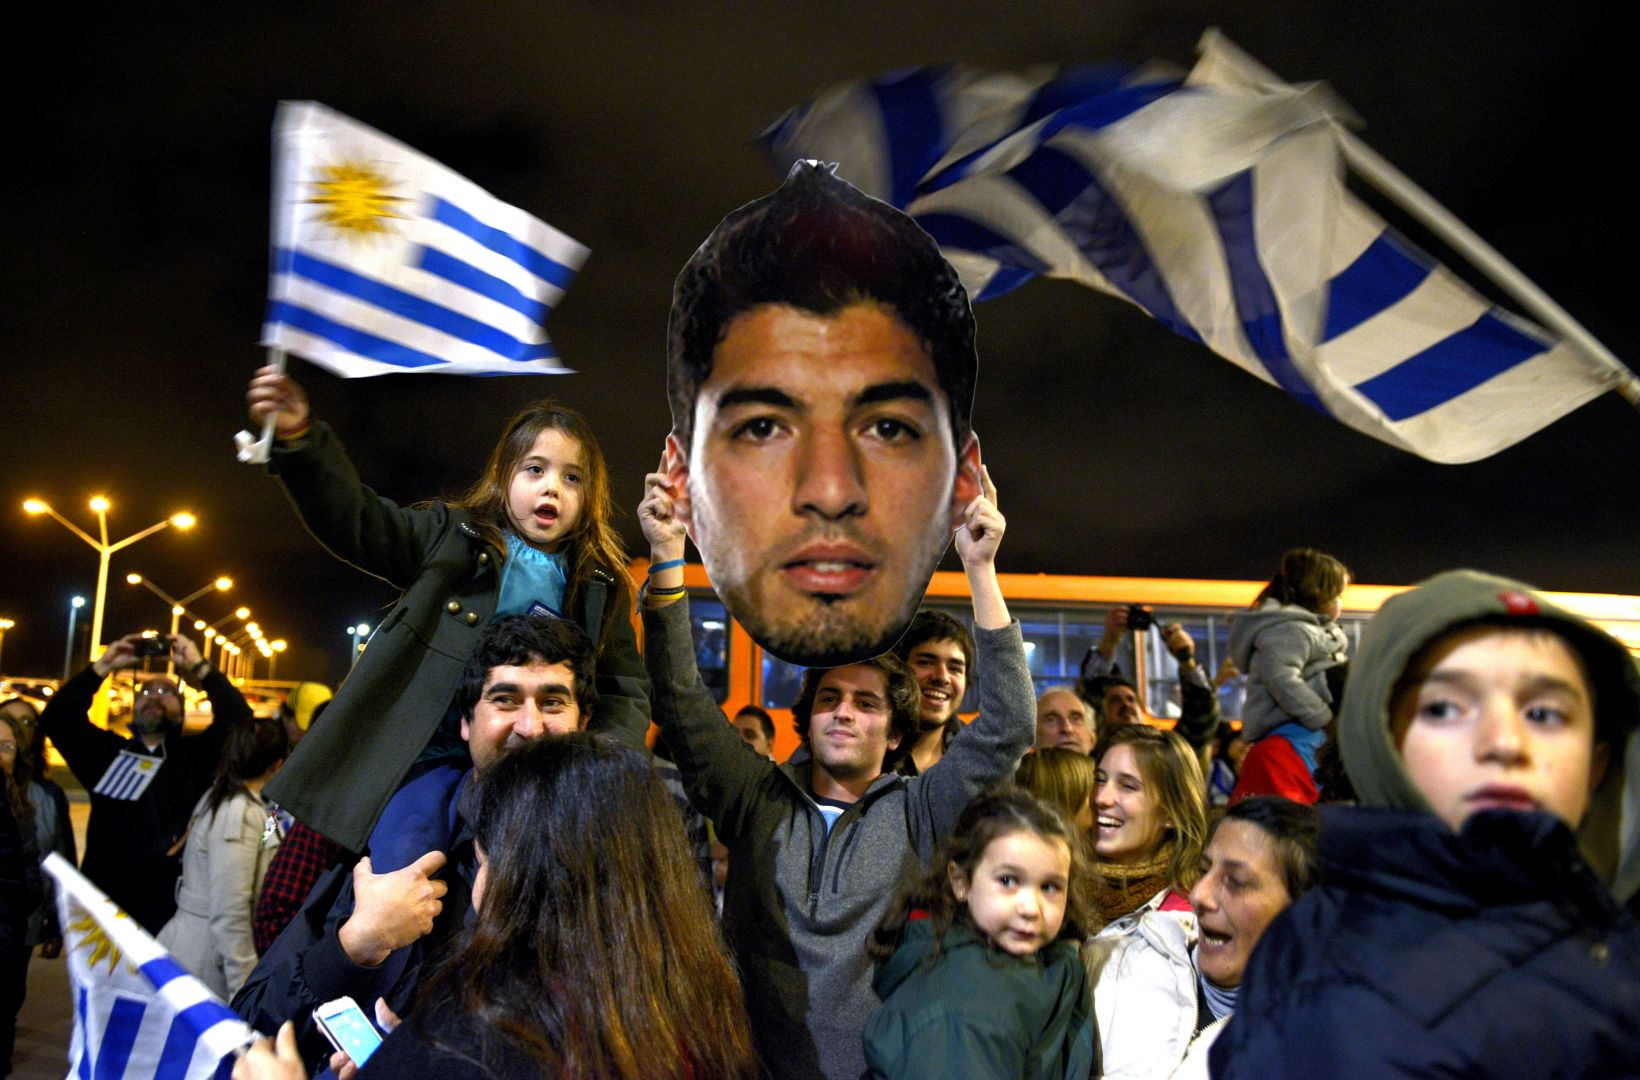 کوپا آمریکا: اروگوئه؛ آسمانی آبی تر با حضور ال پیستولرو